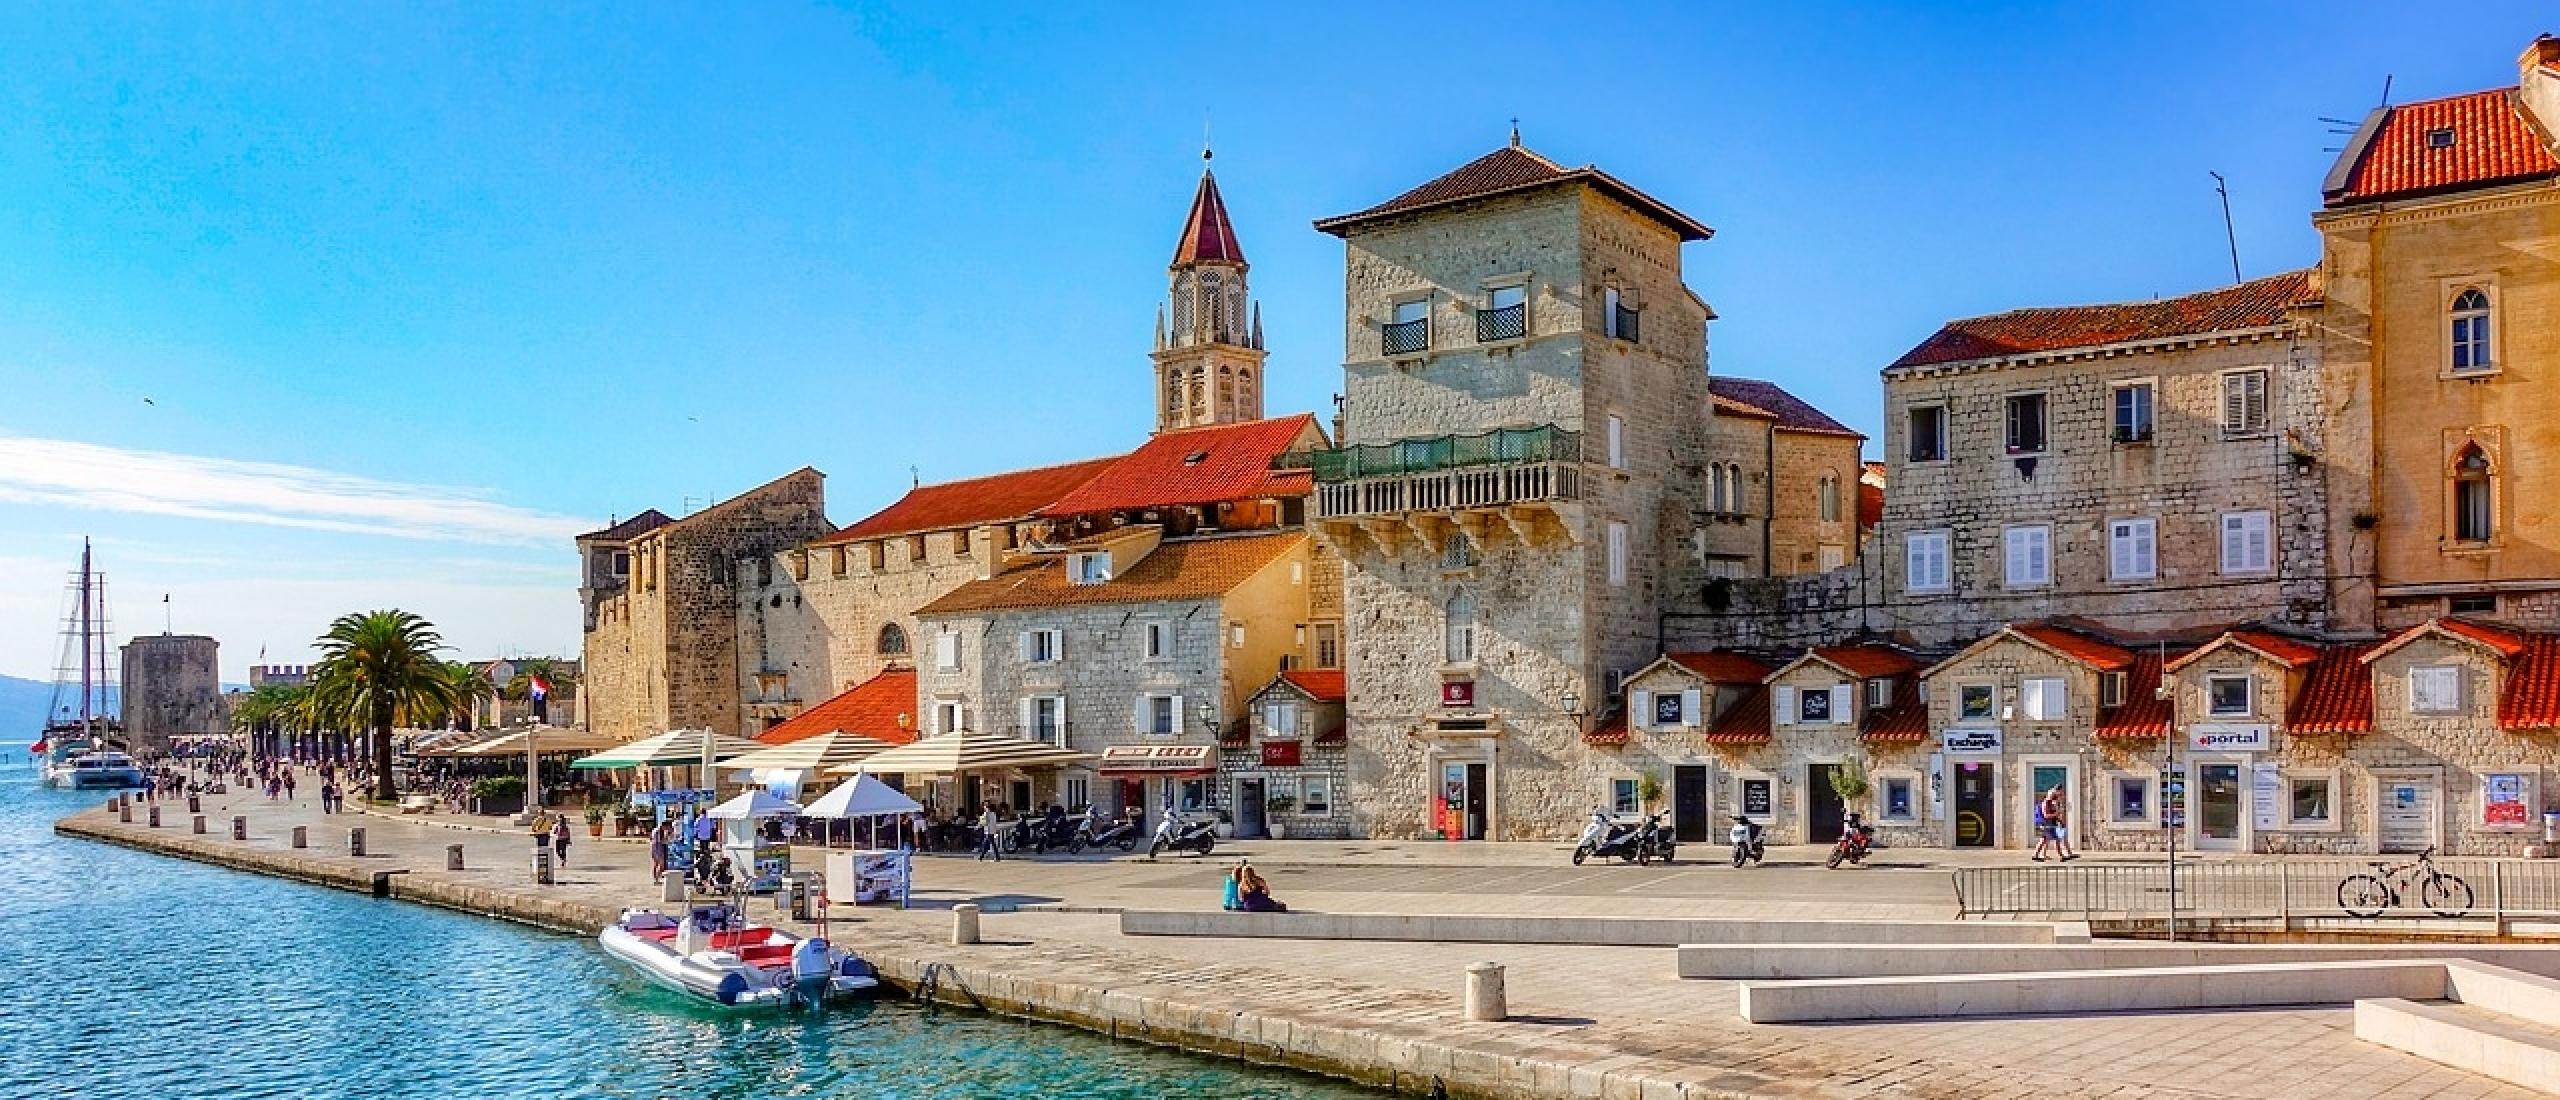 Vele culturele monumenten in Kroatisch Dalmatië